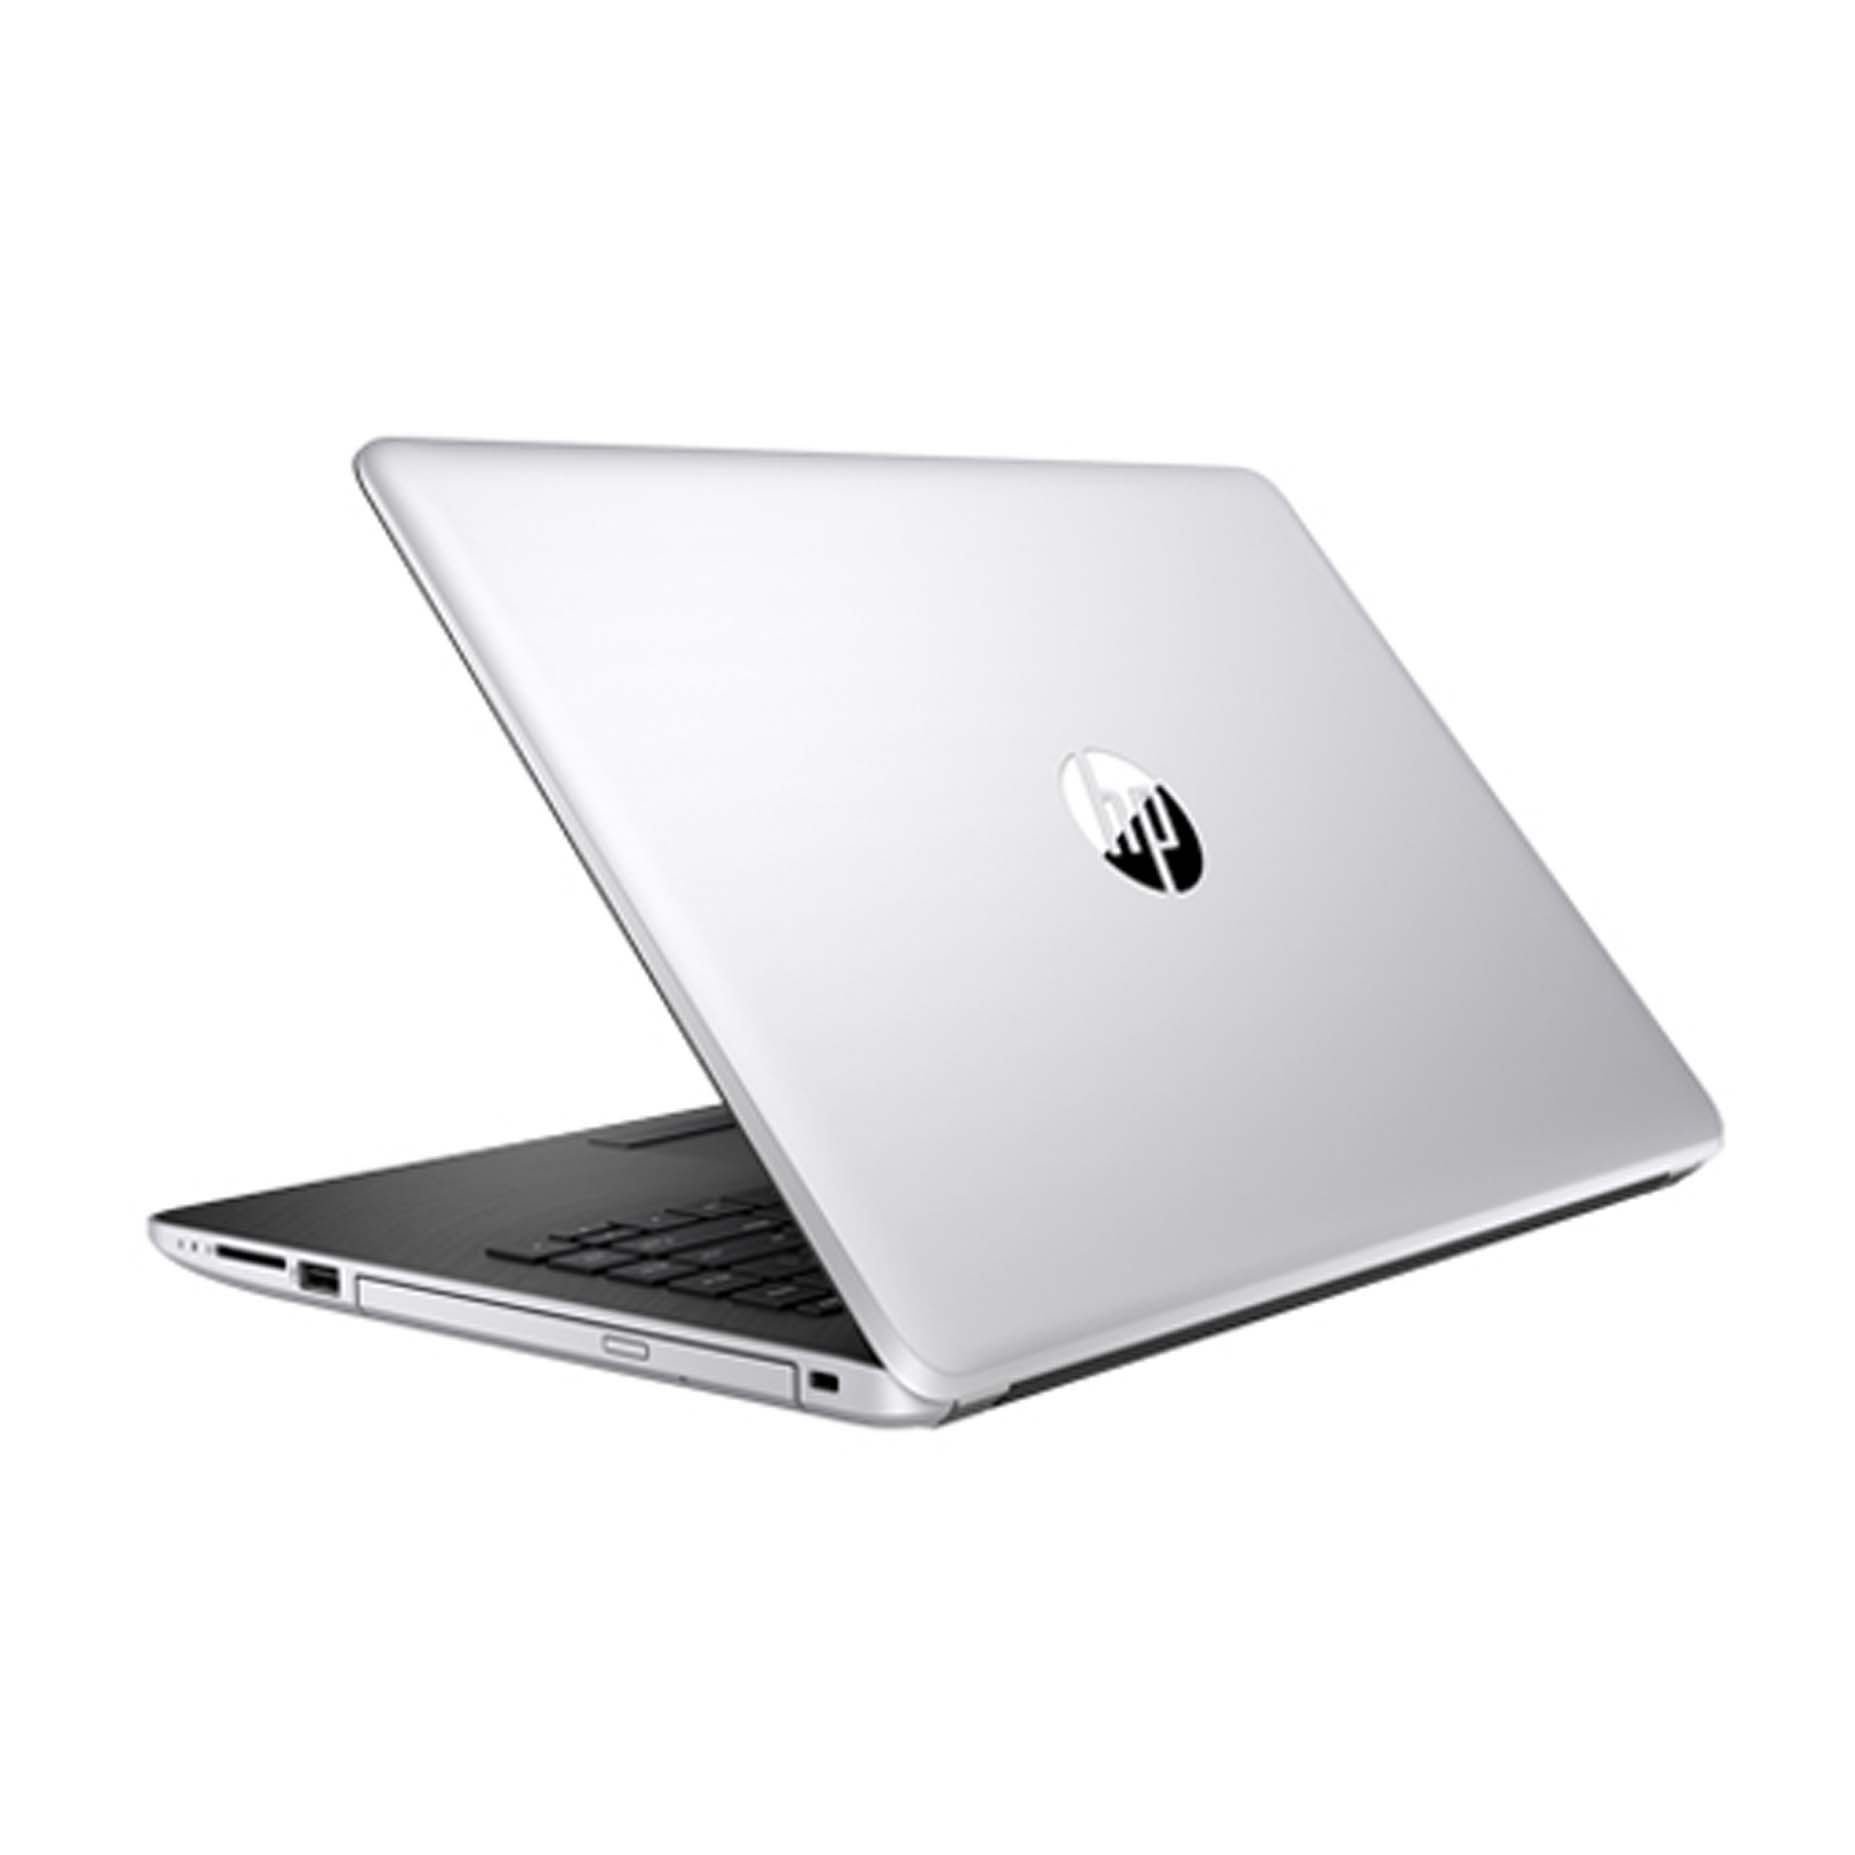 Harga HP Notebook 14-BW023AX AMD A9-9420 4GB 1TB Radeon 520 2GB Win10 14Inch HD SILVER